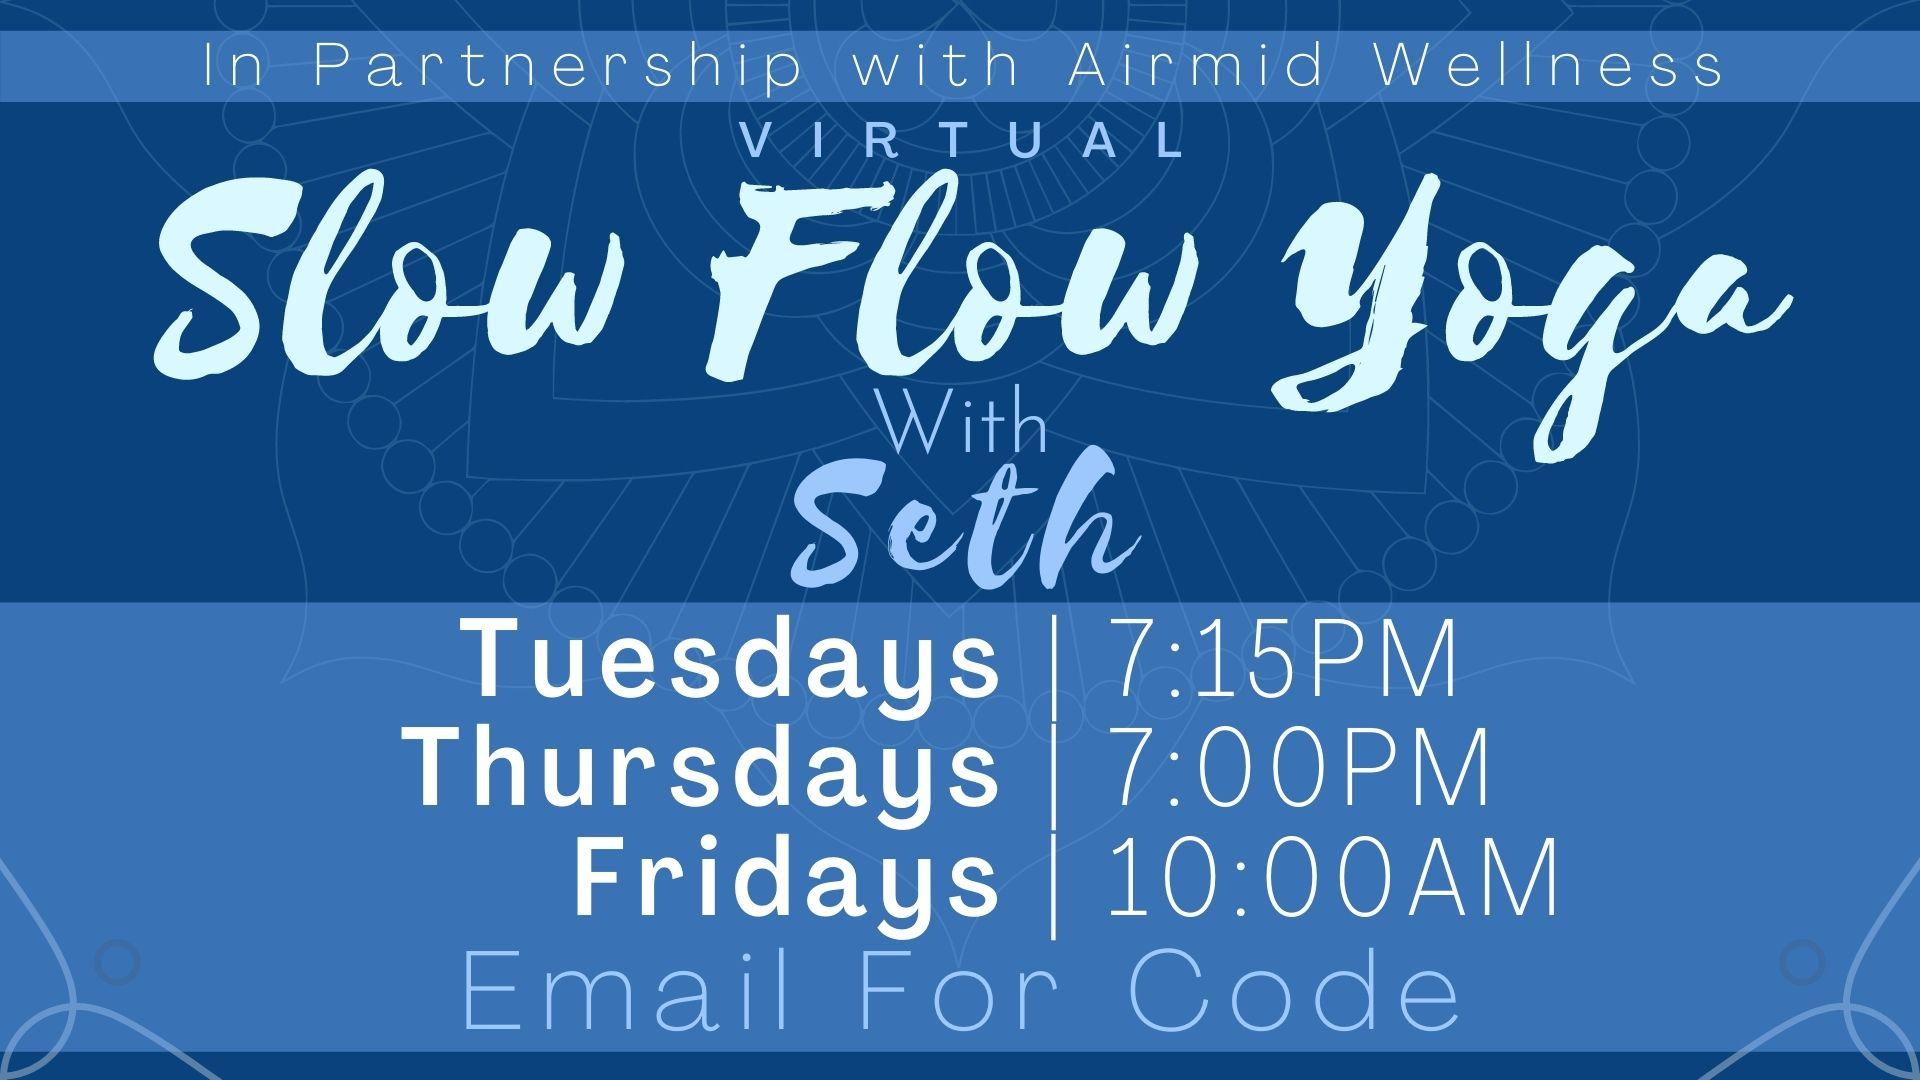 Slow Flow Intermediate Yoga with Seth